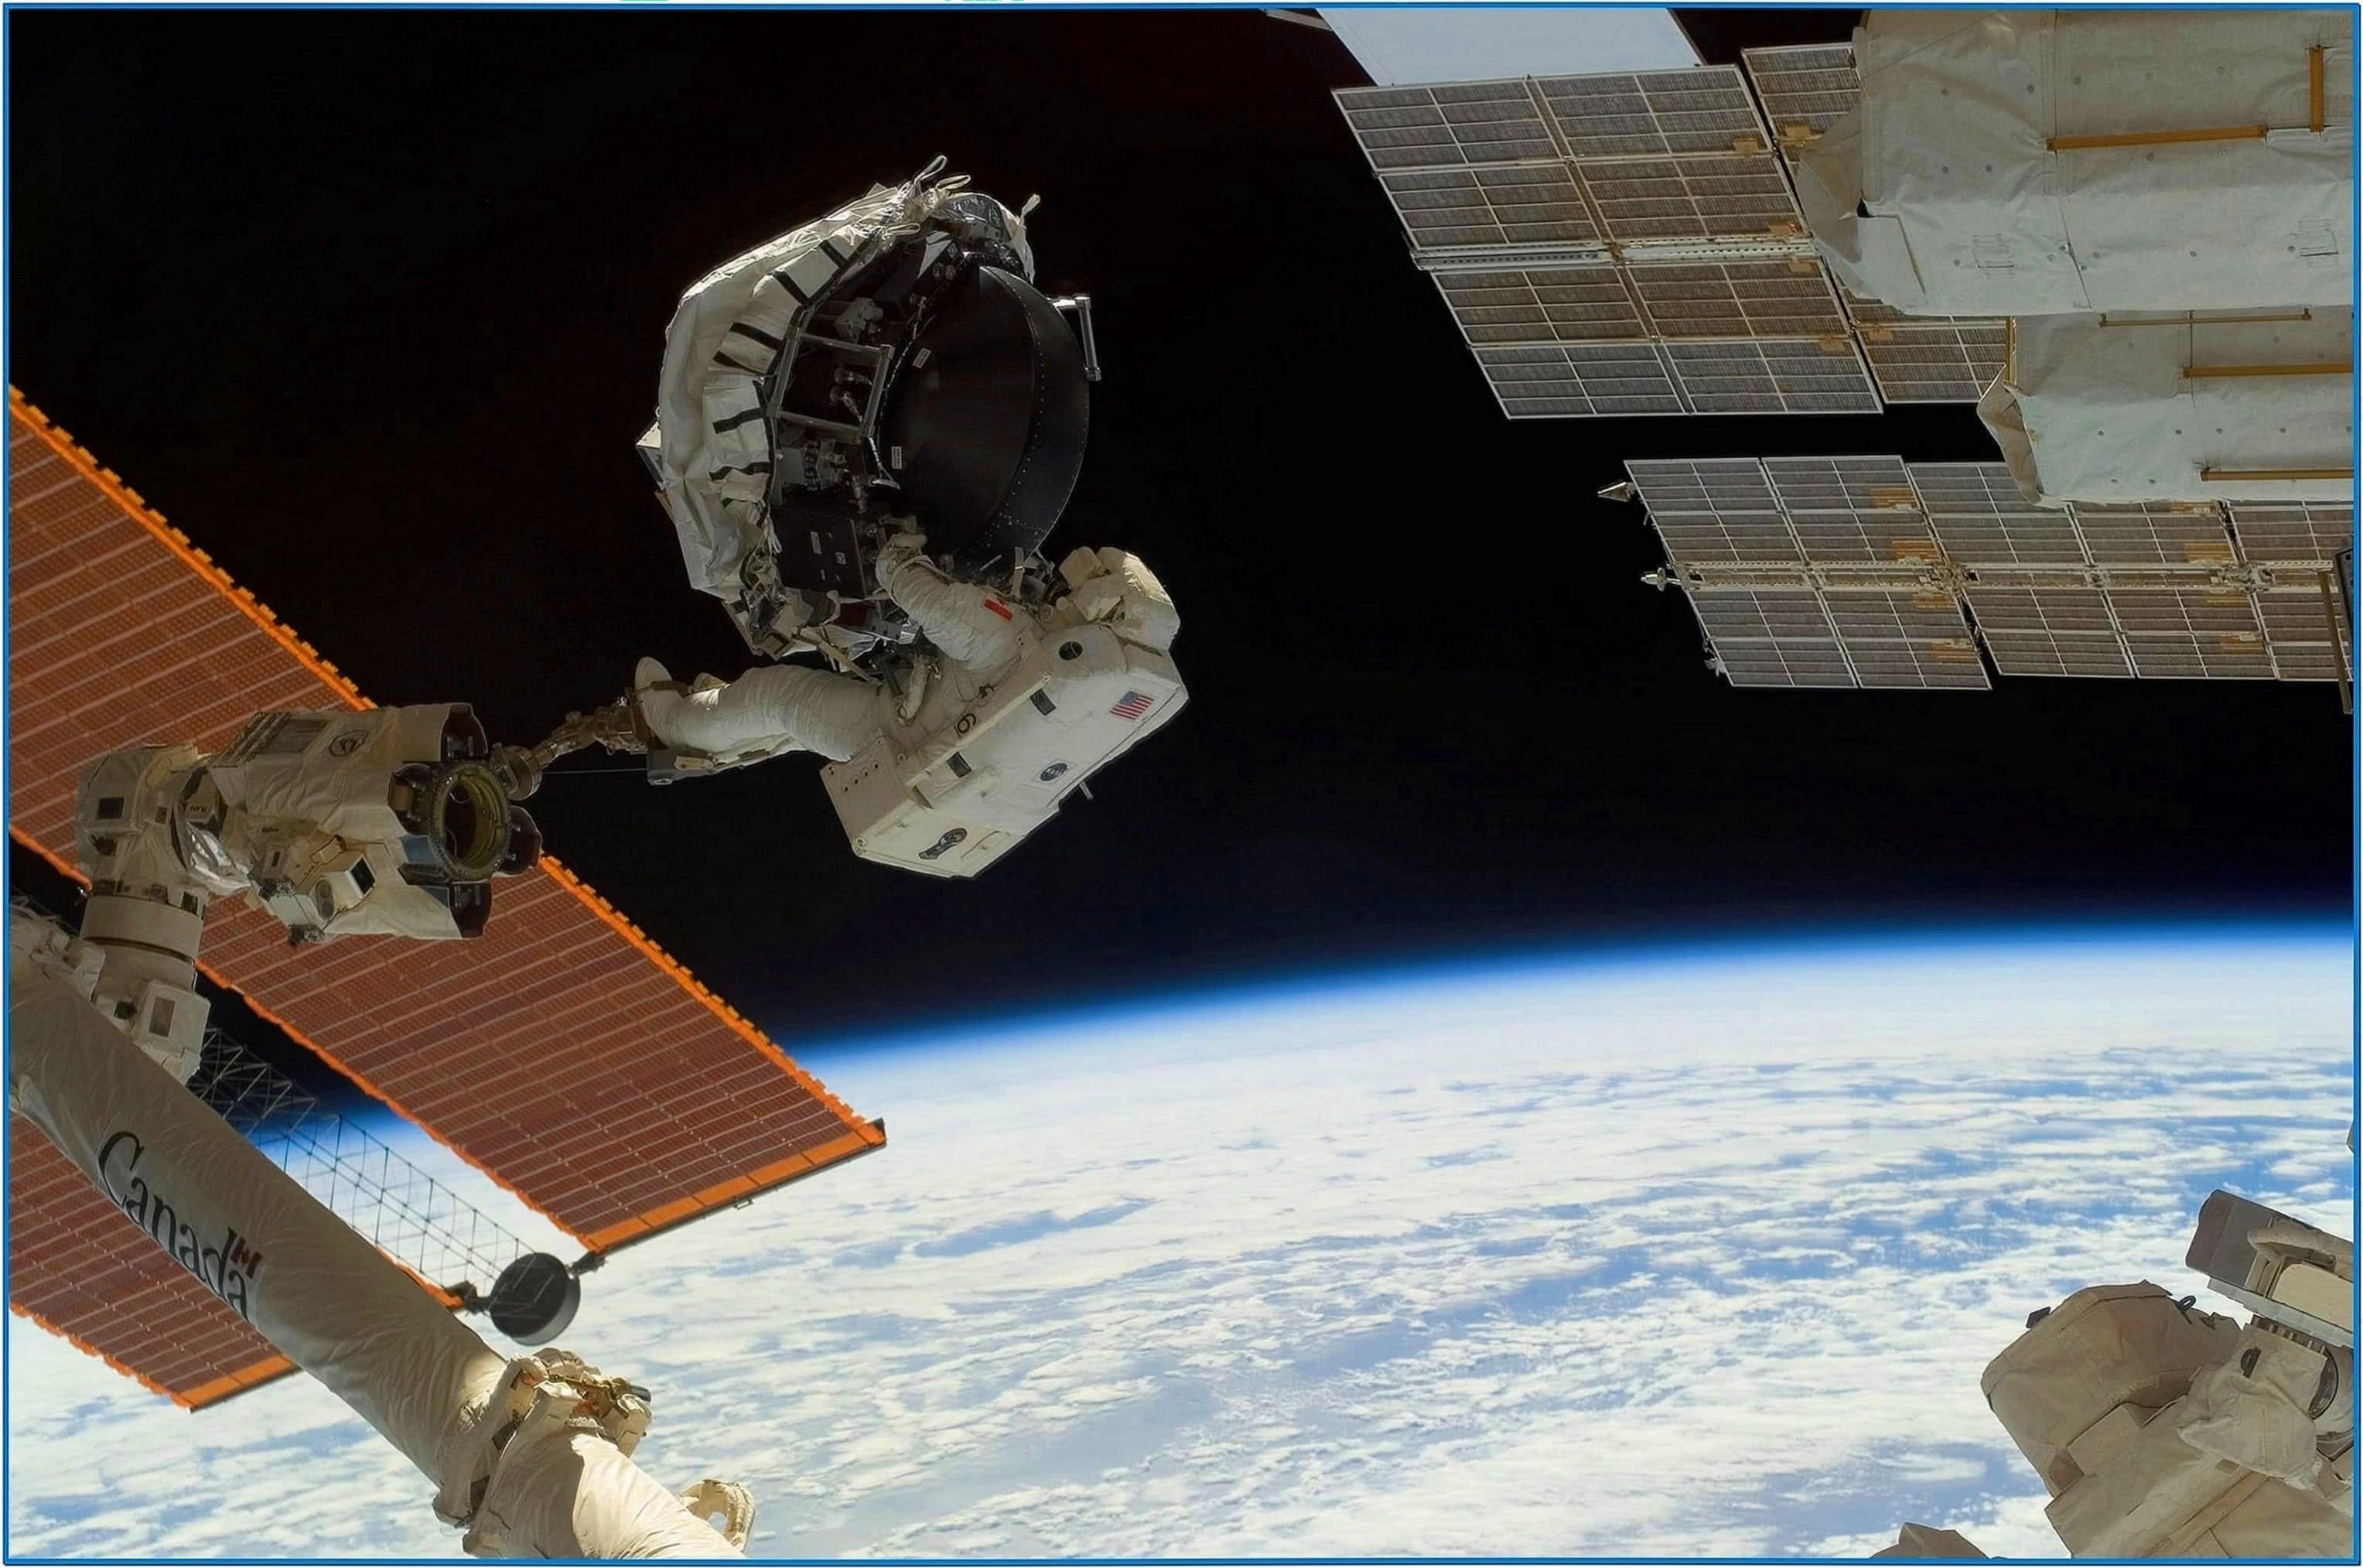 Nasa space images screensaver